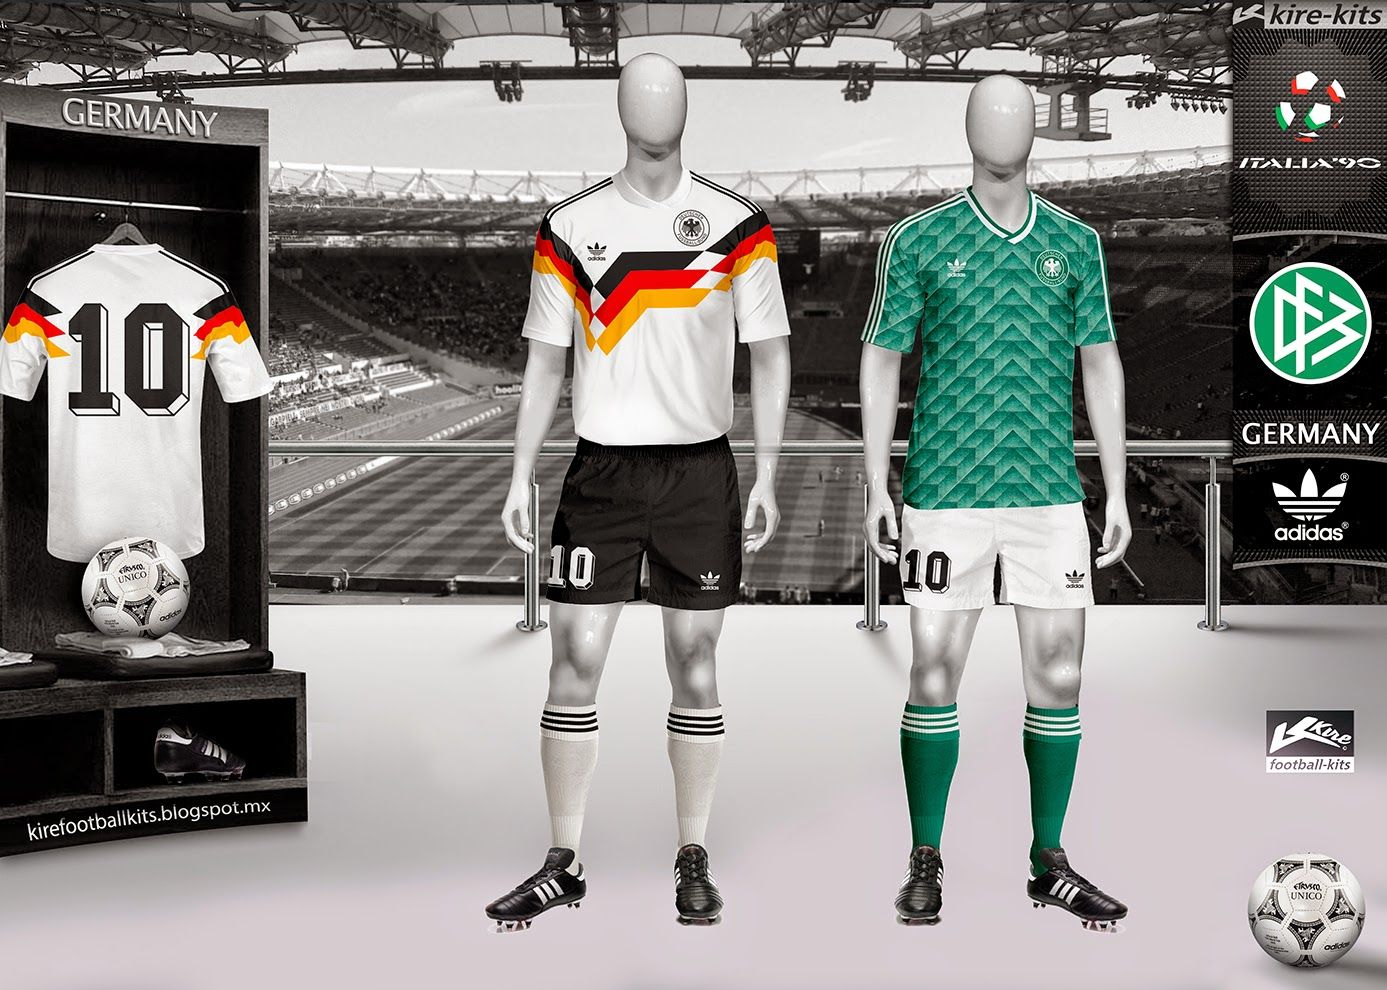 Kire Football Kits Germany Kits World Cup 1990 In 2020 Football Kits Germany Kit Football Fashion